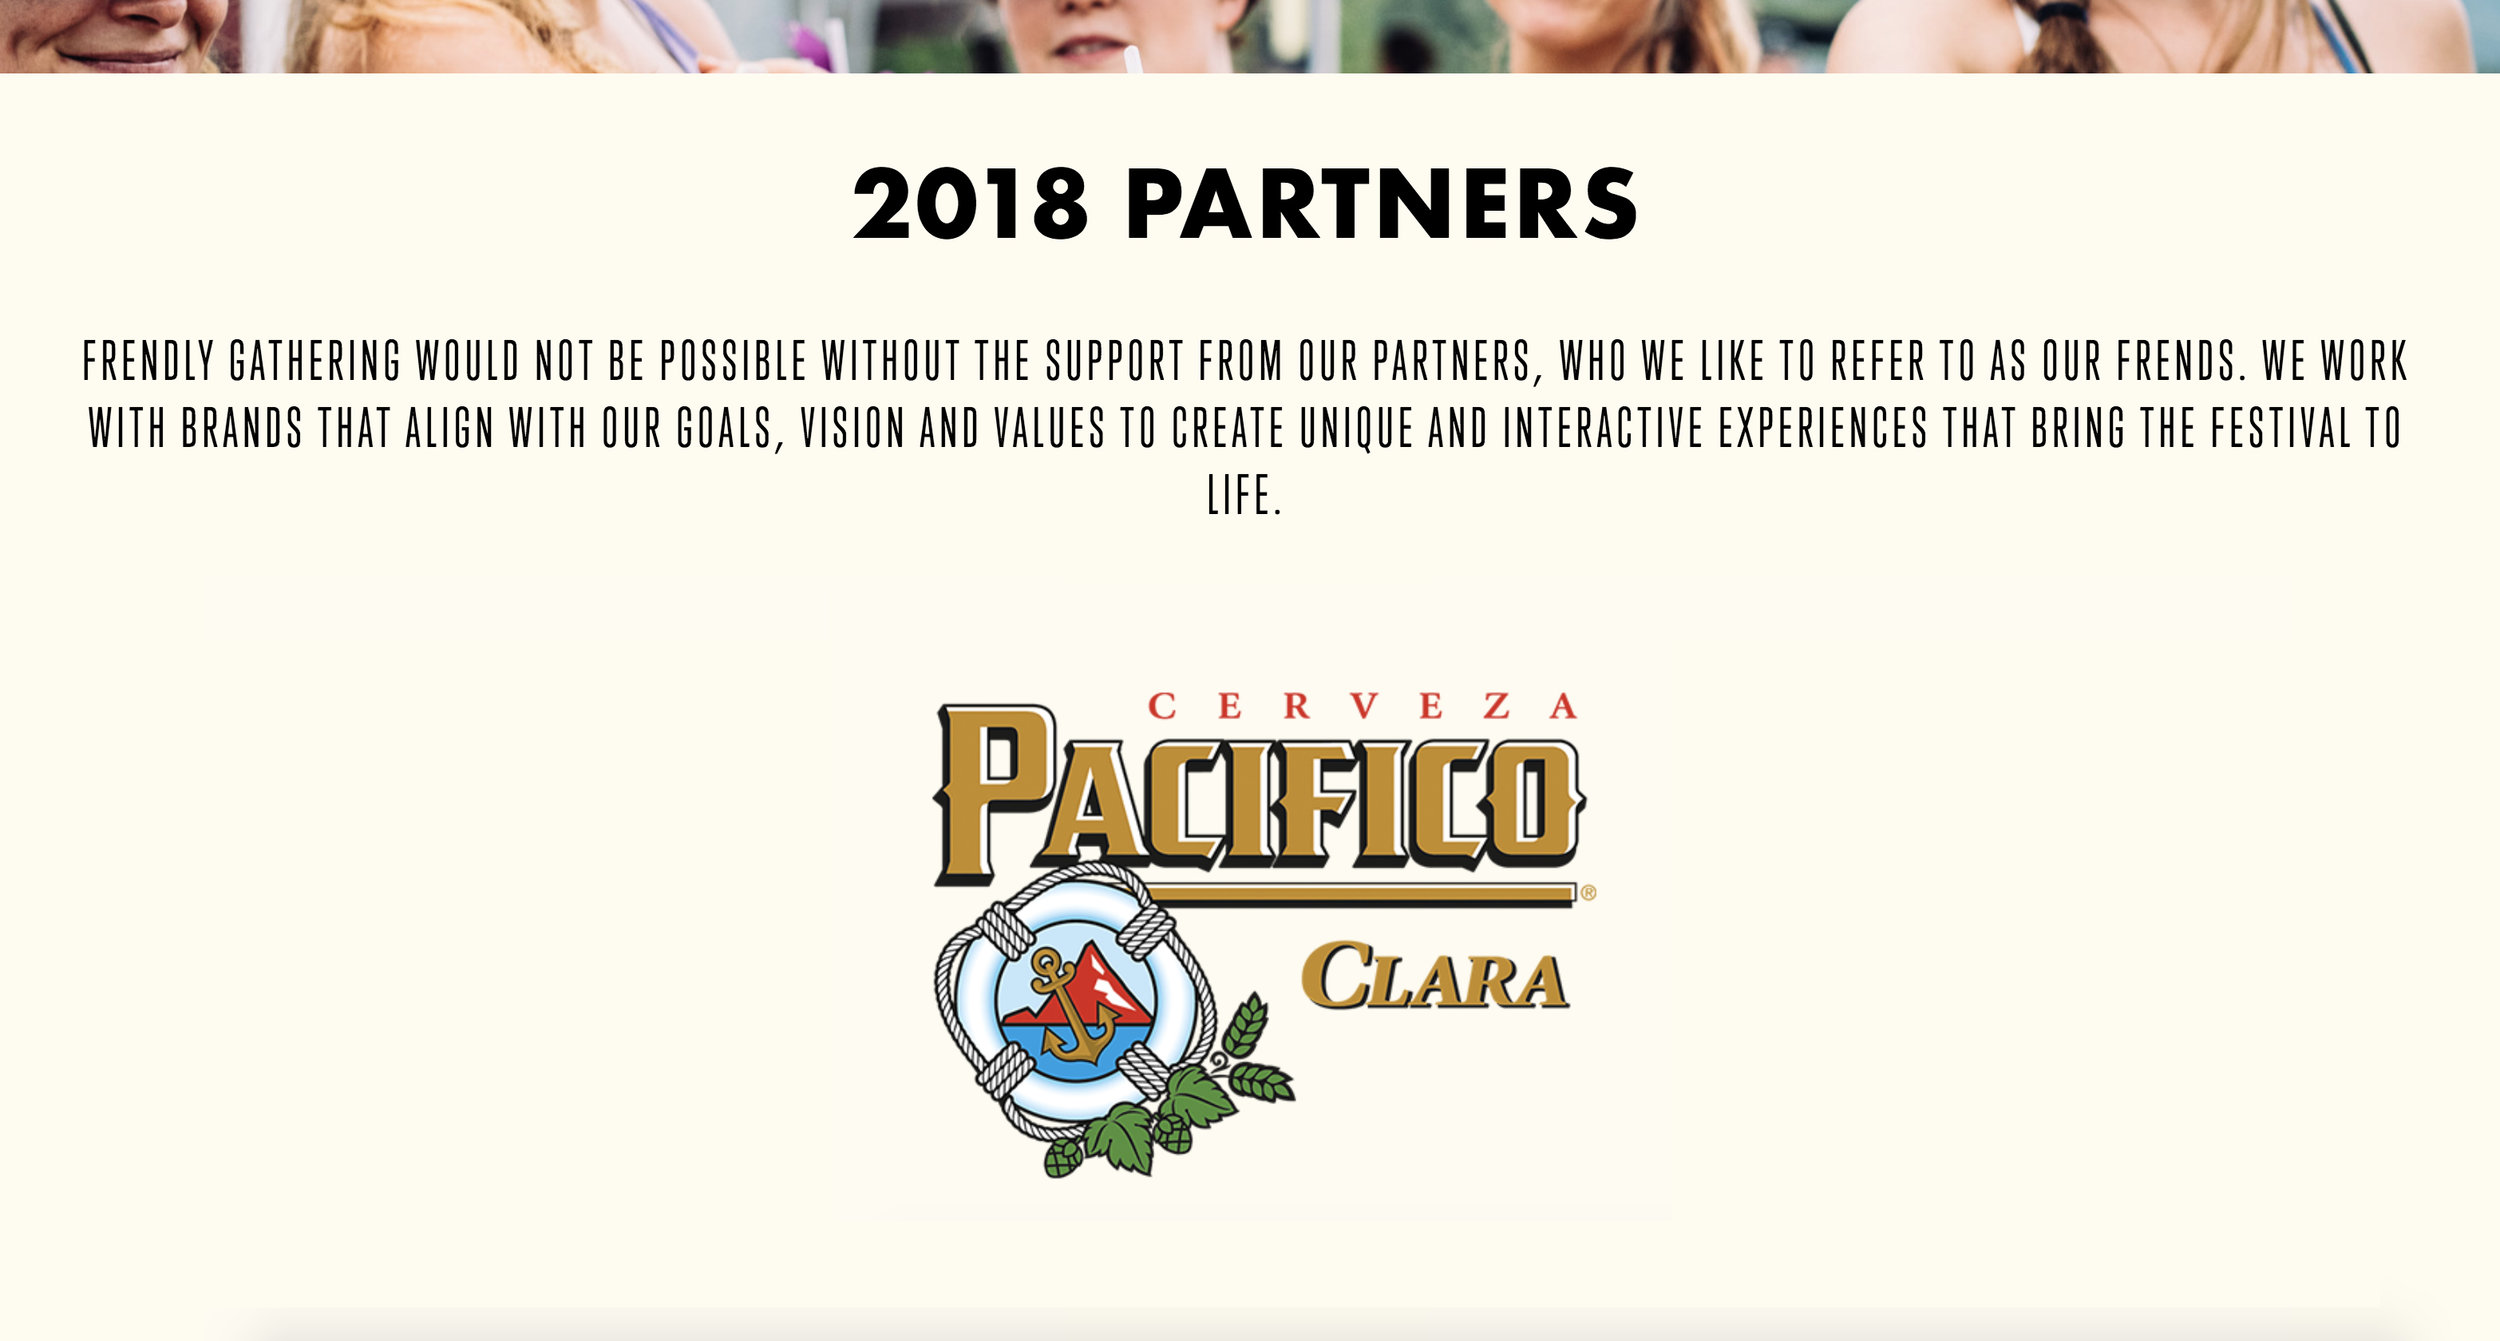 Partner - PACIFICO.jpg